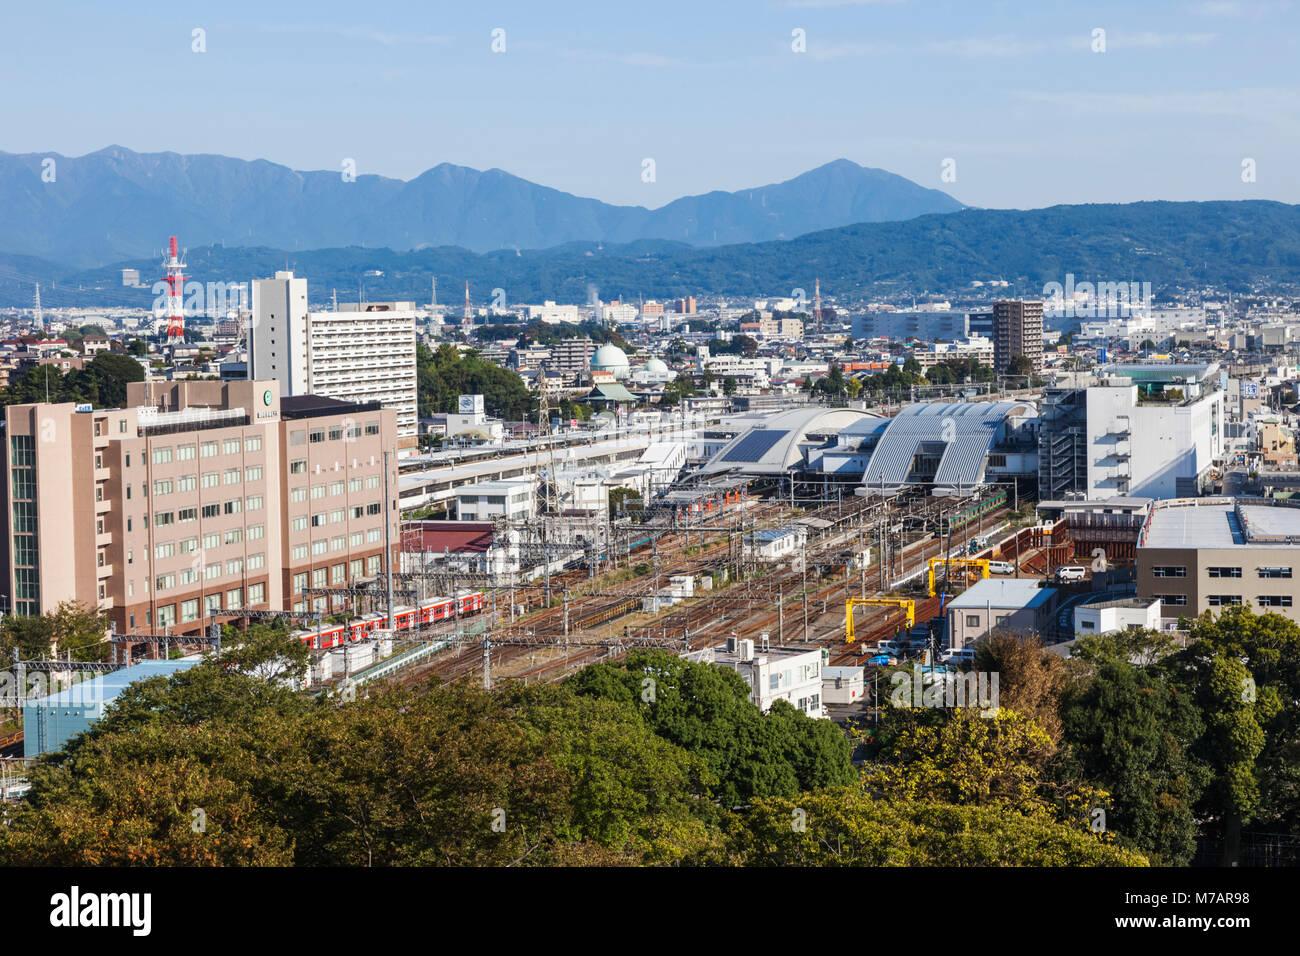 Japan, Honshu, Kanagawa Prefecture, Odawara, City Skyline View from Odawara Castle - Stock Image